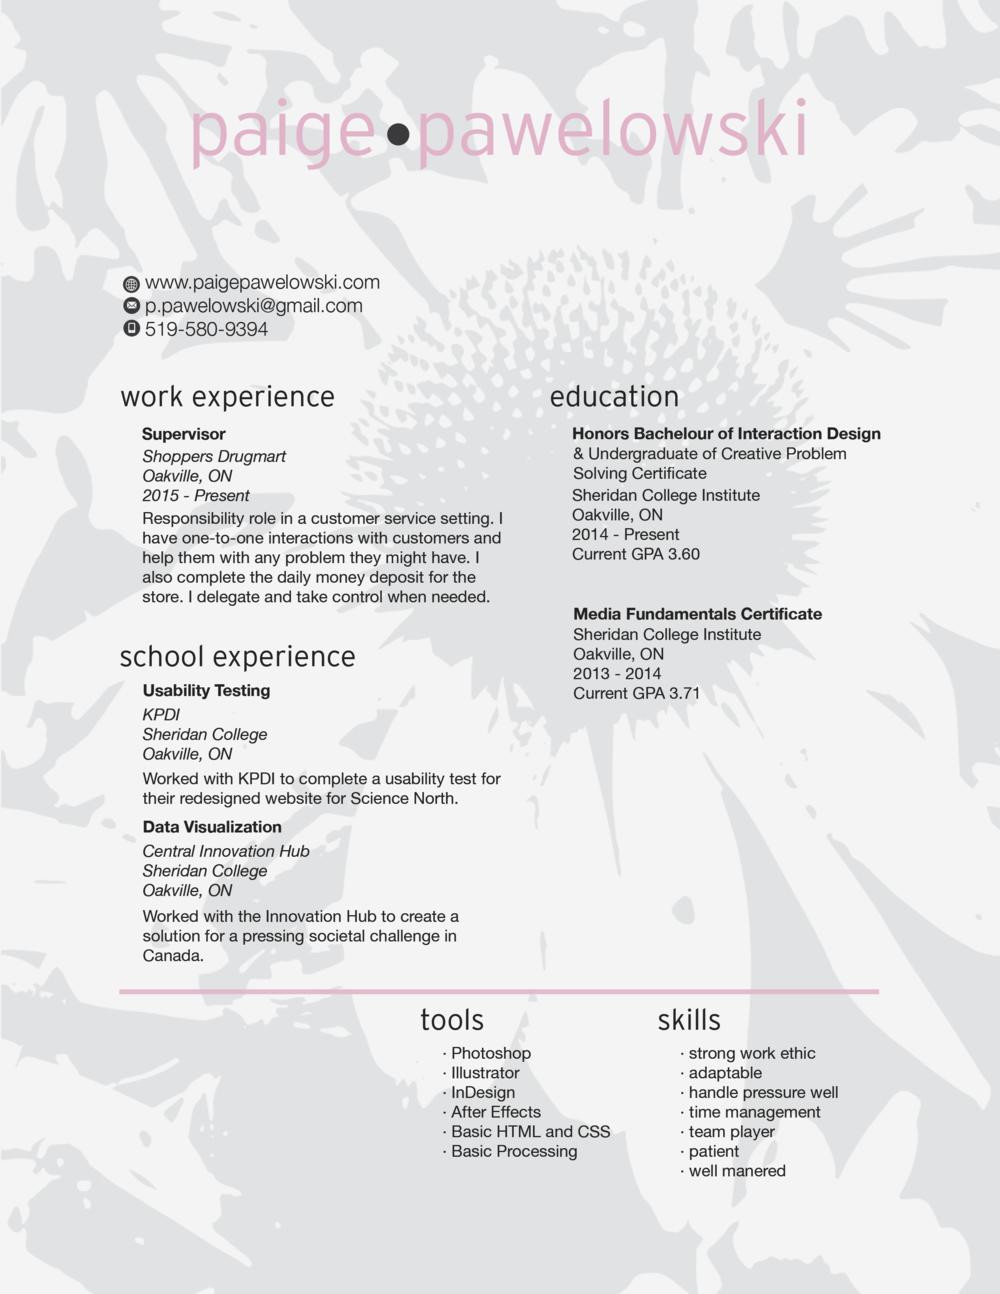 sheridan college resume help optimal resume at sheridan college